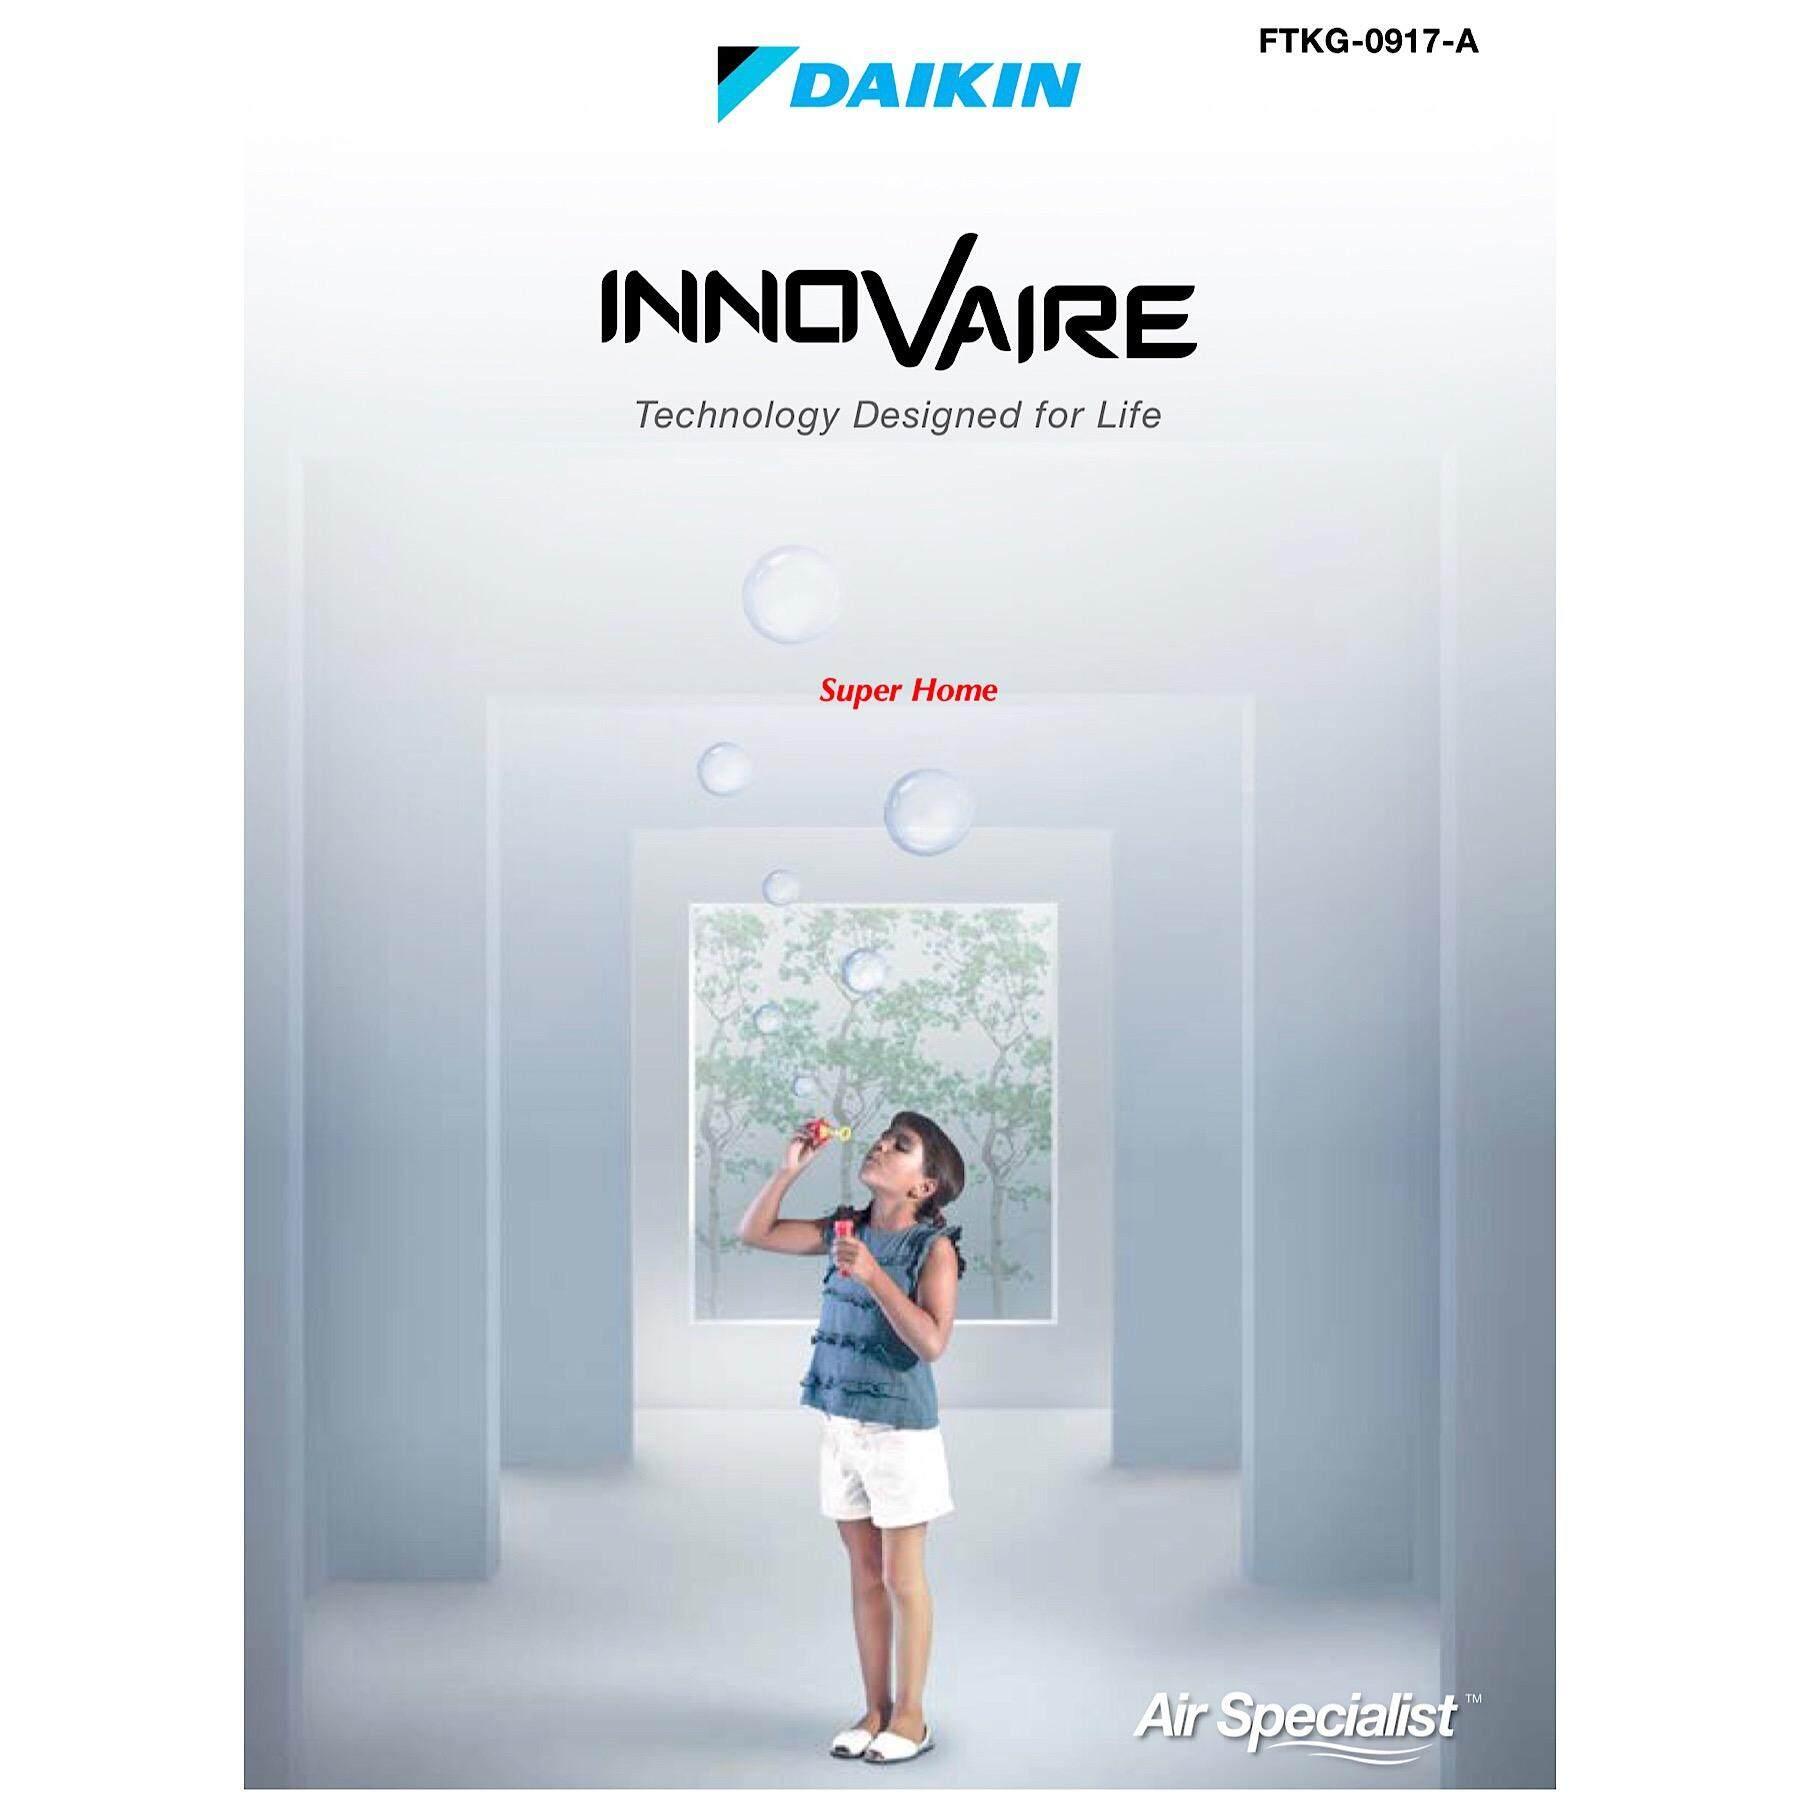 Daikin Ftkg50q Amp Rkg50f Innovaire In End 2 9 2019 11 15 Pm